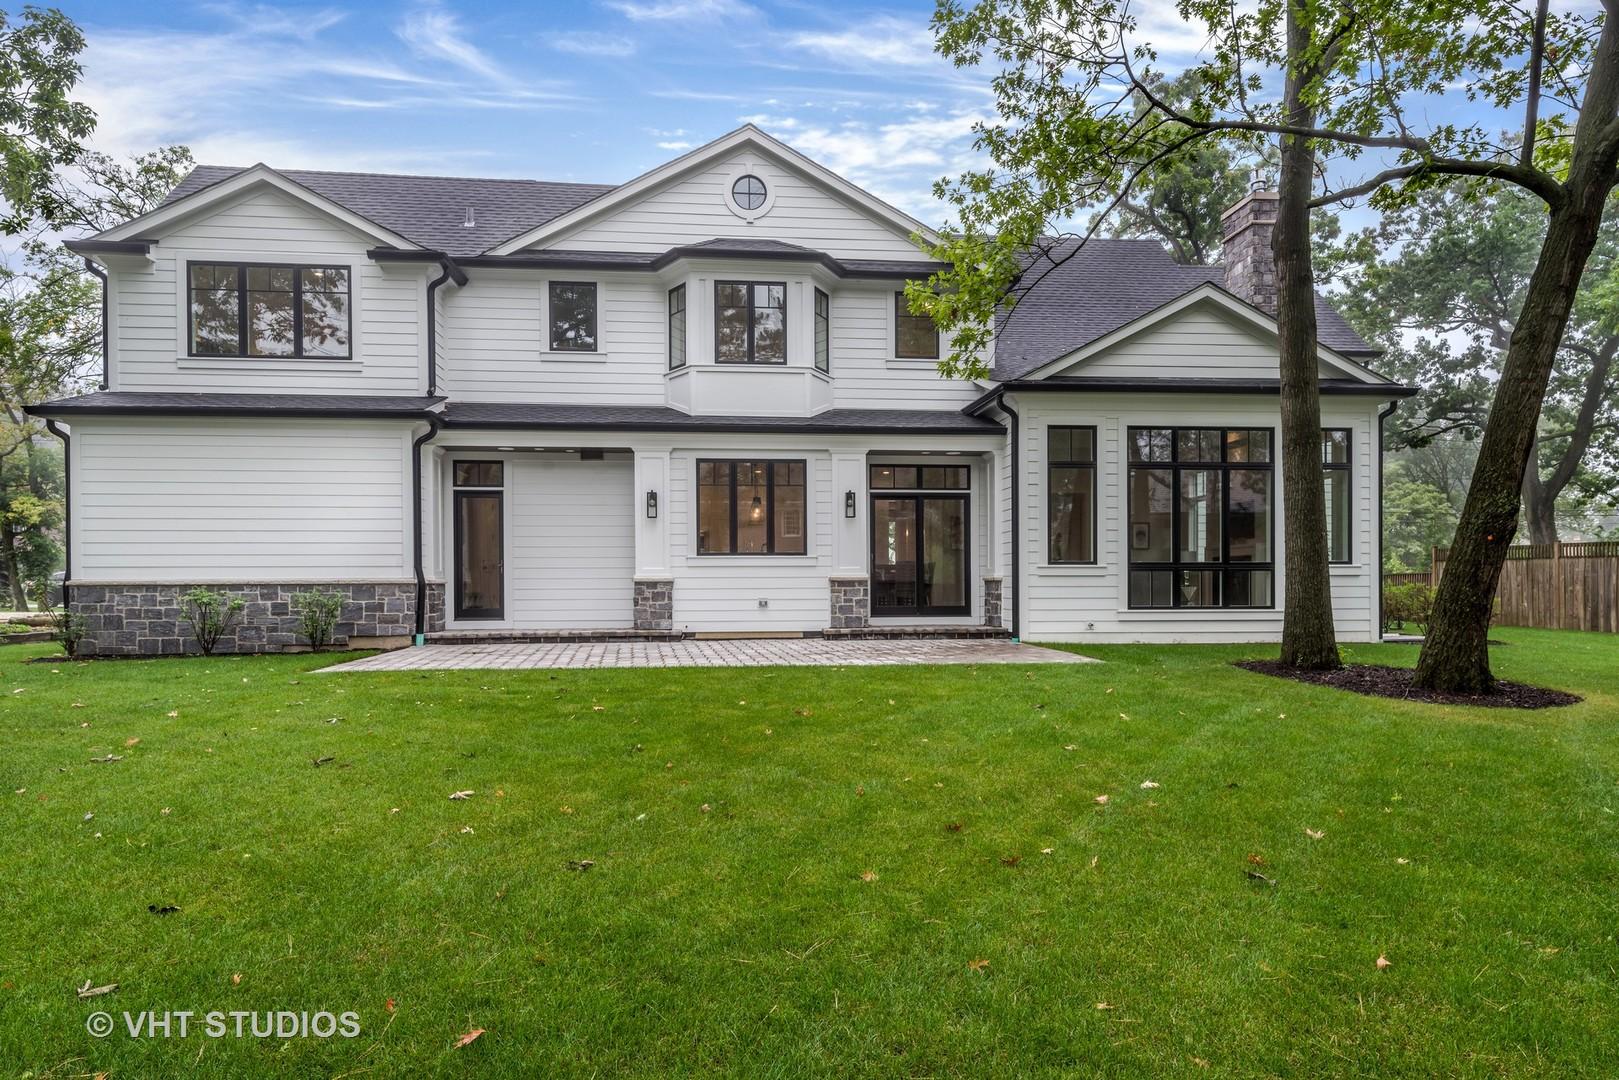 1454 Woodlawn, Glenview, Illinois, 60025